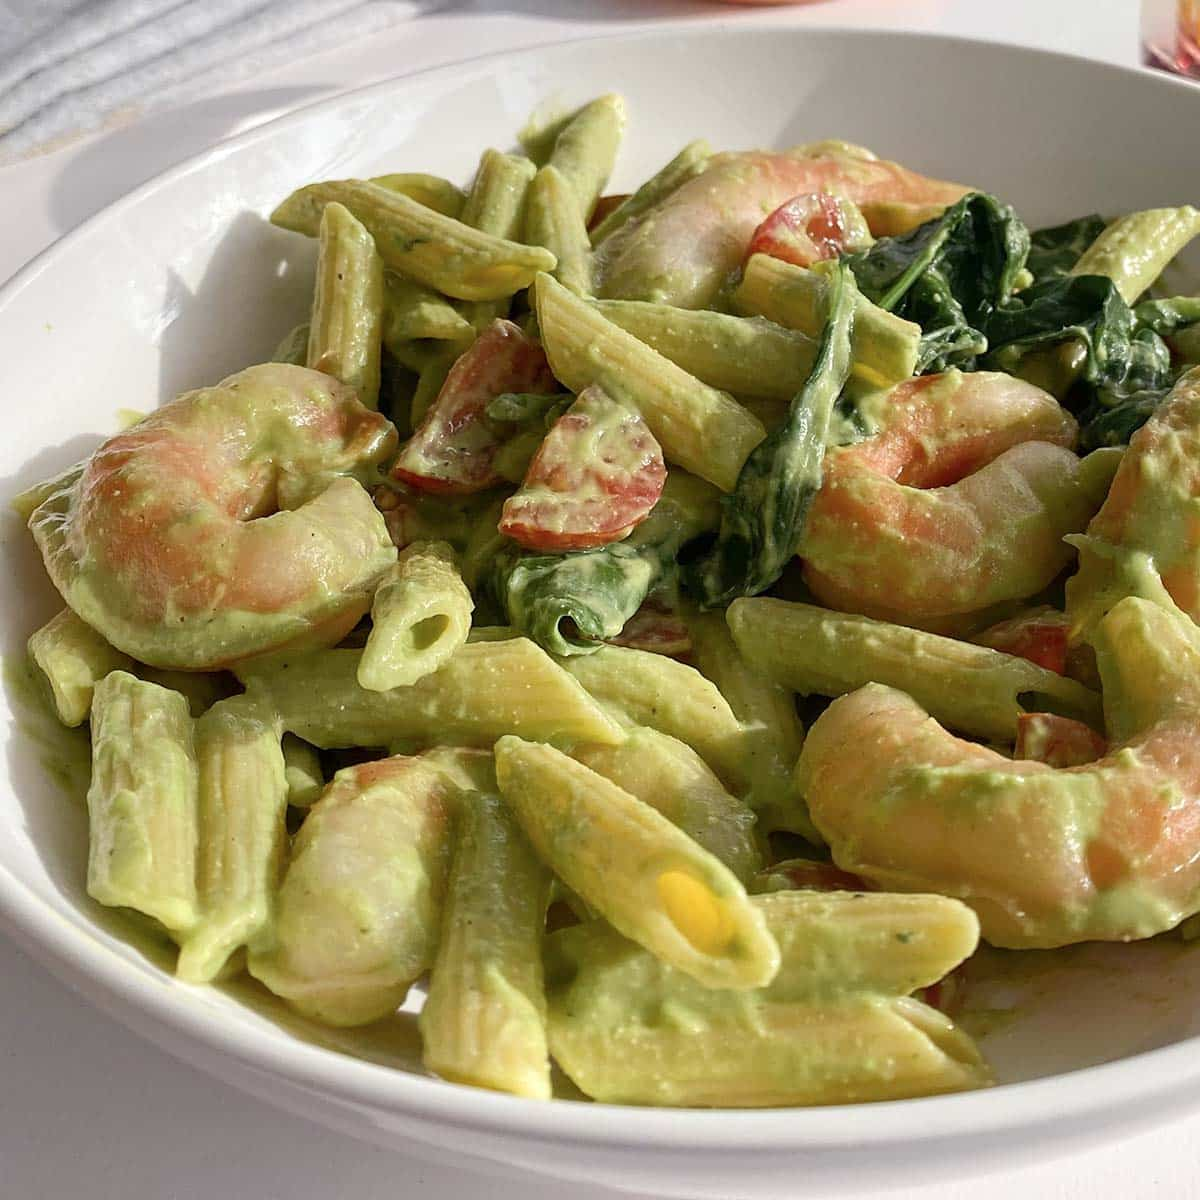 pesto pasta with vegan shrimp, baby kale, and tomatoes